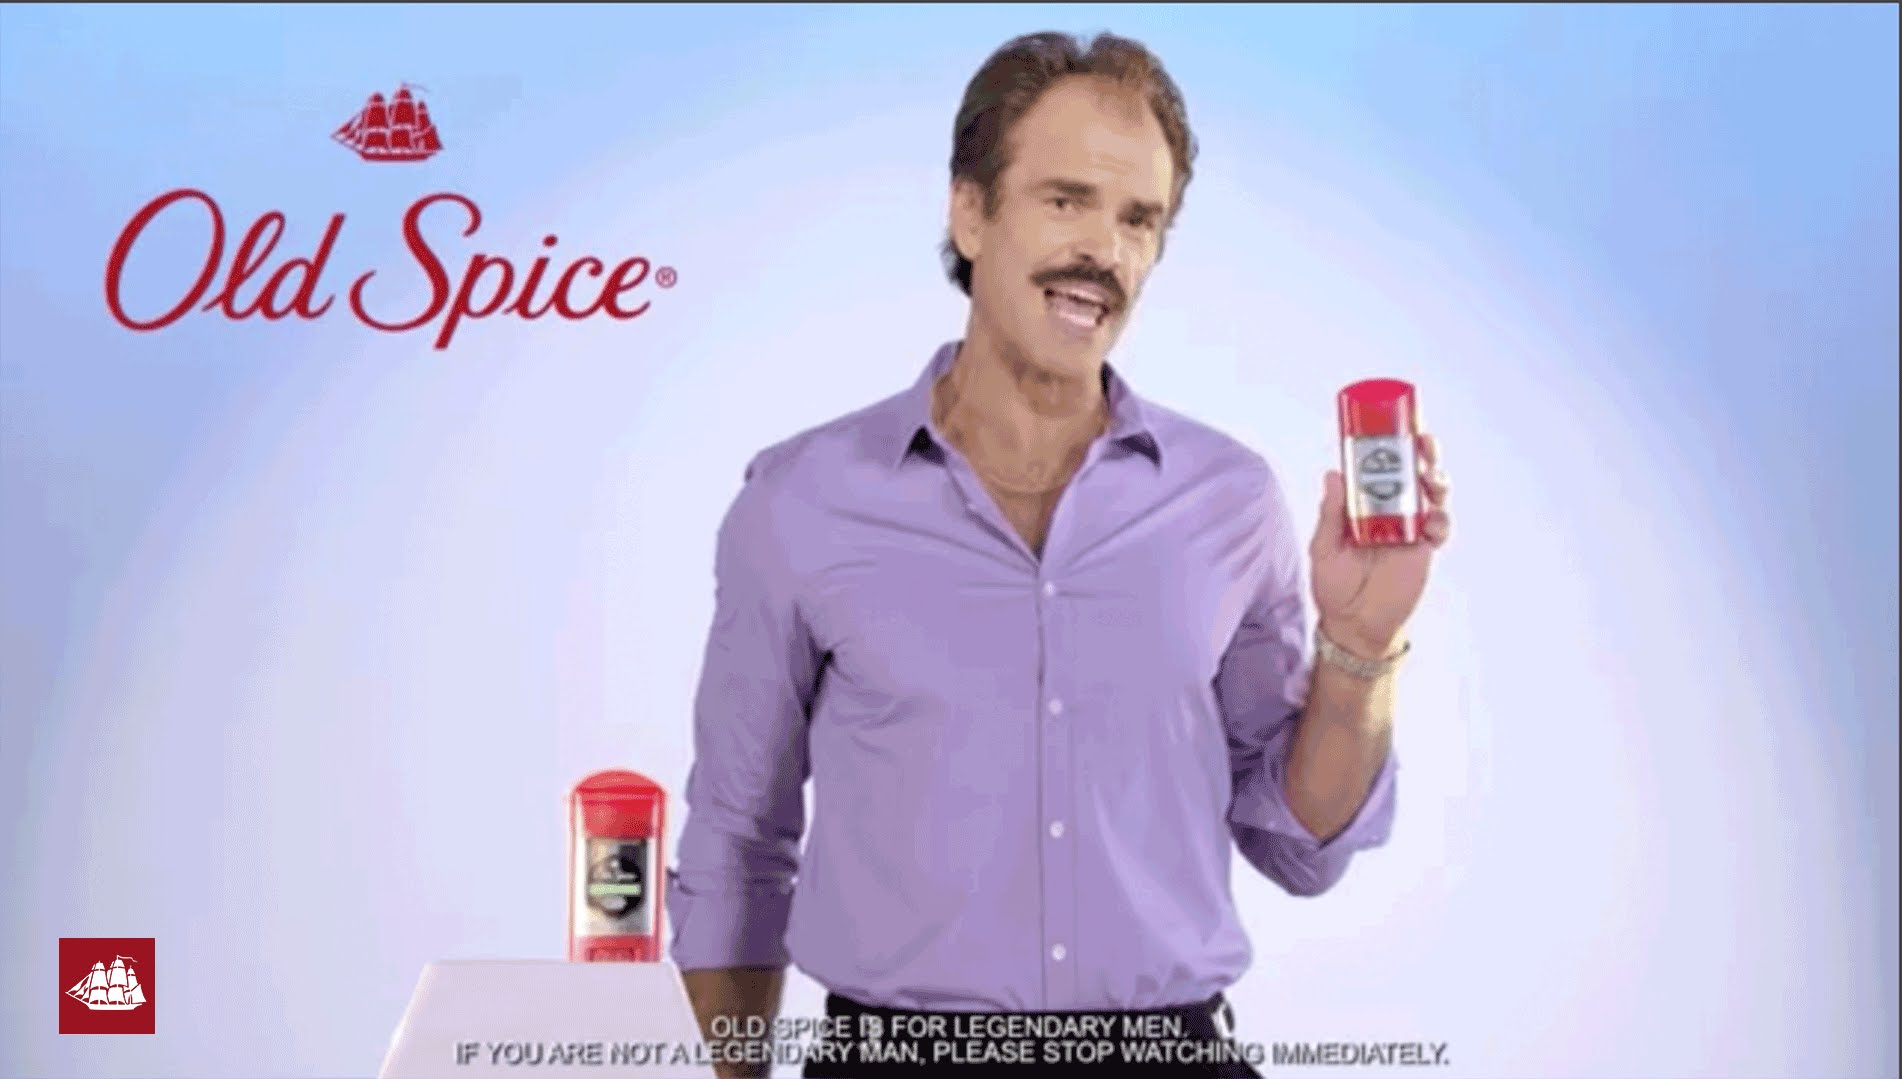 Steven Ogg (Trevor From GTA V) Demonstrates Old Spice's Odor